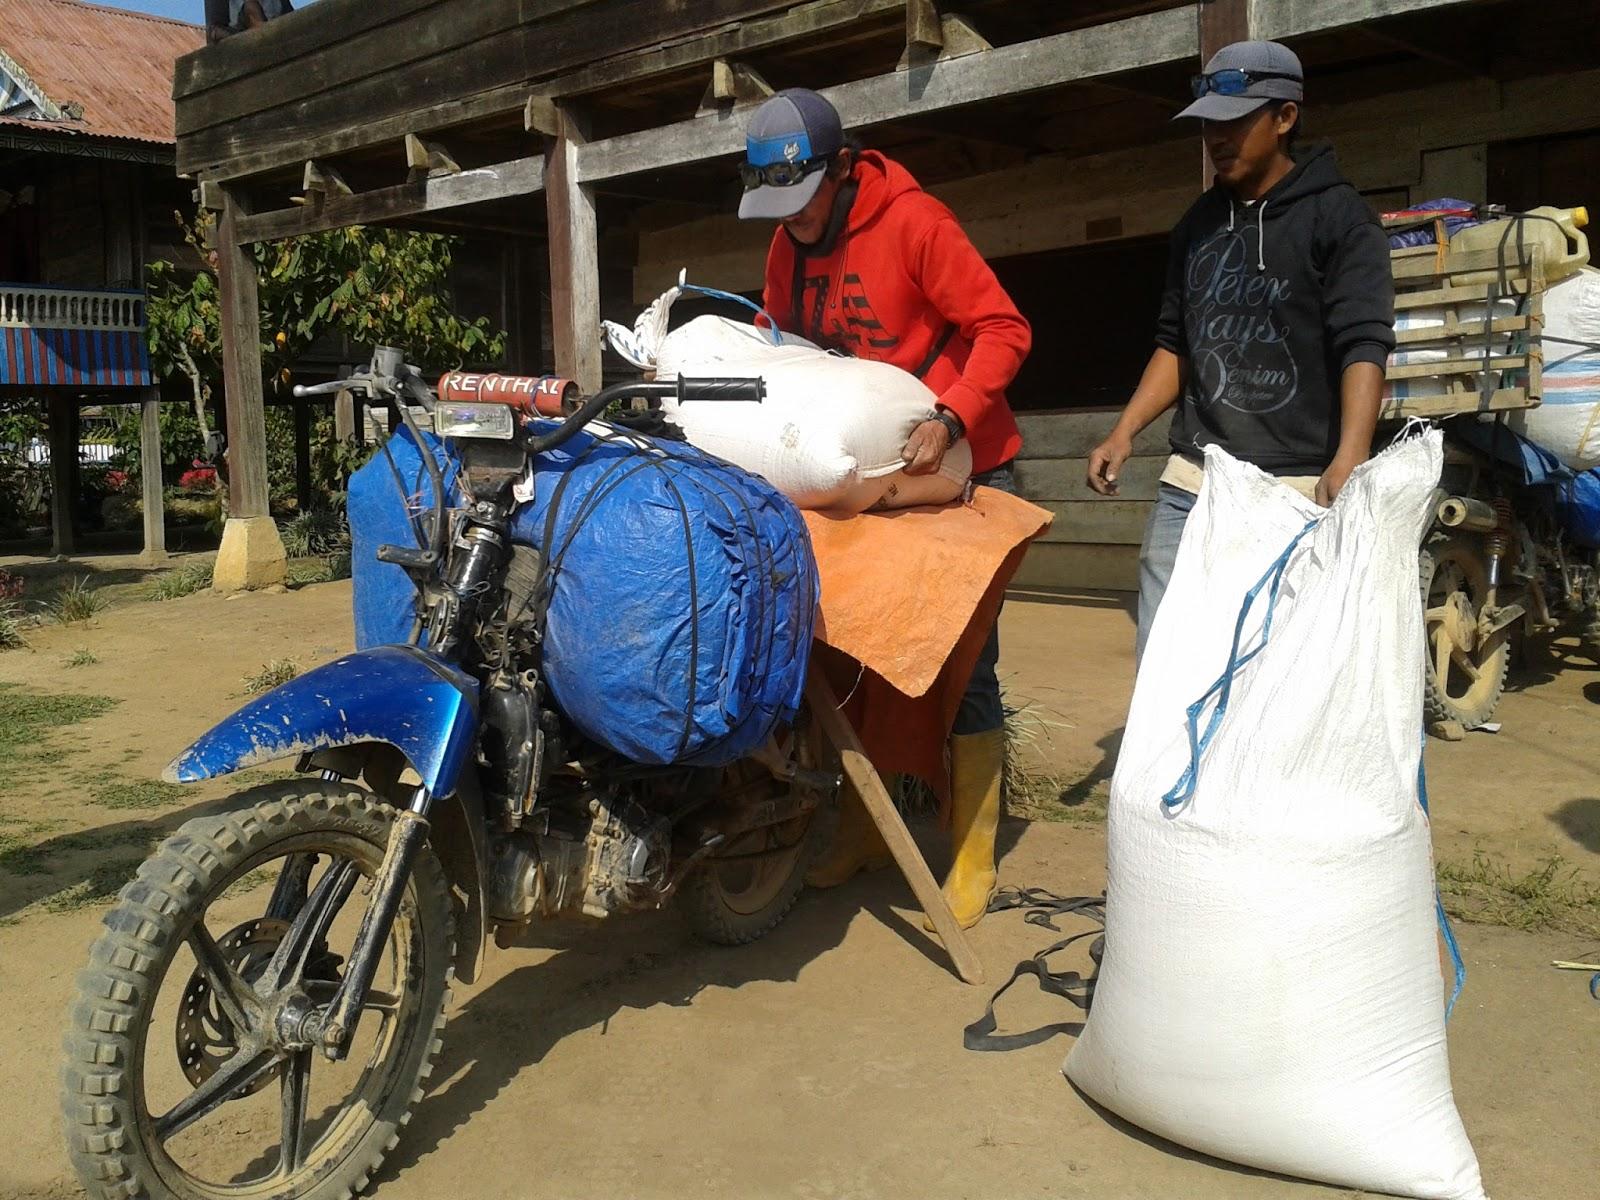 Burhanuddin tengah menyiapkan barang untuk dibawa ke Kota